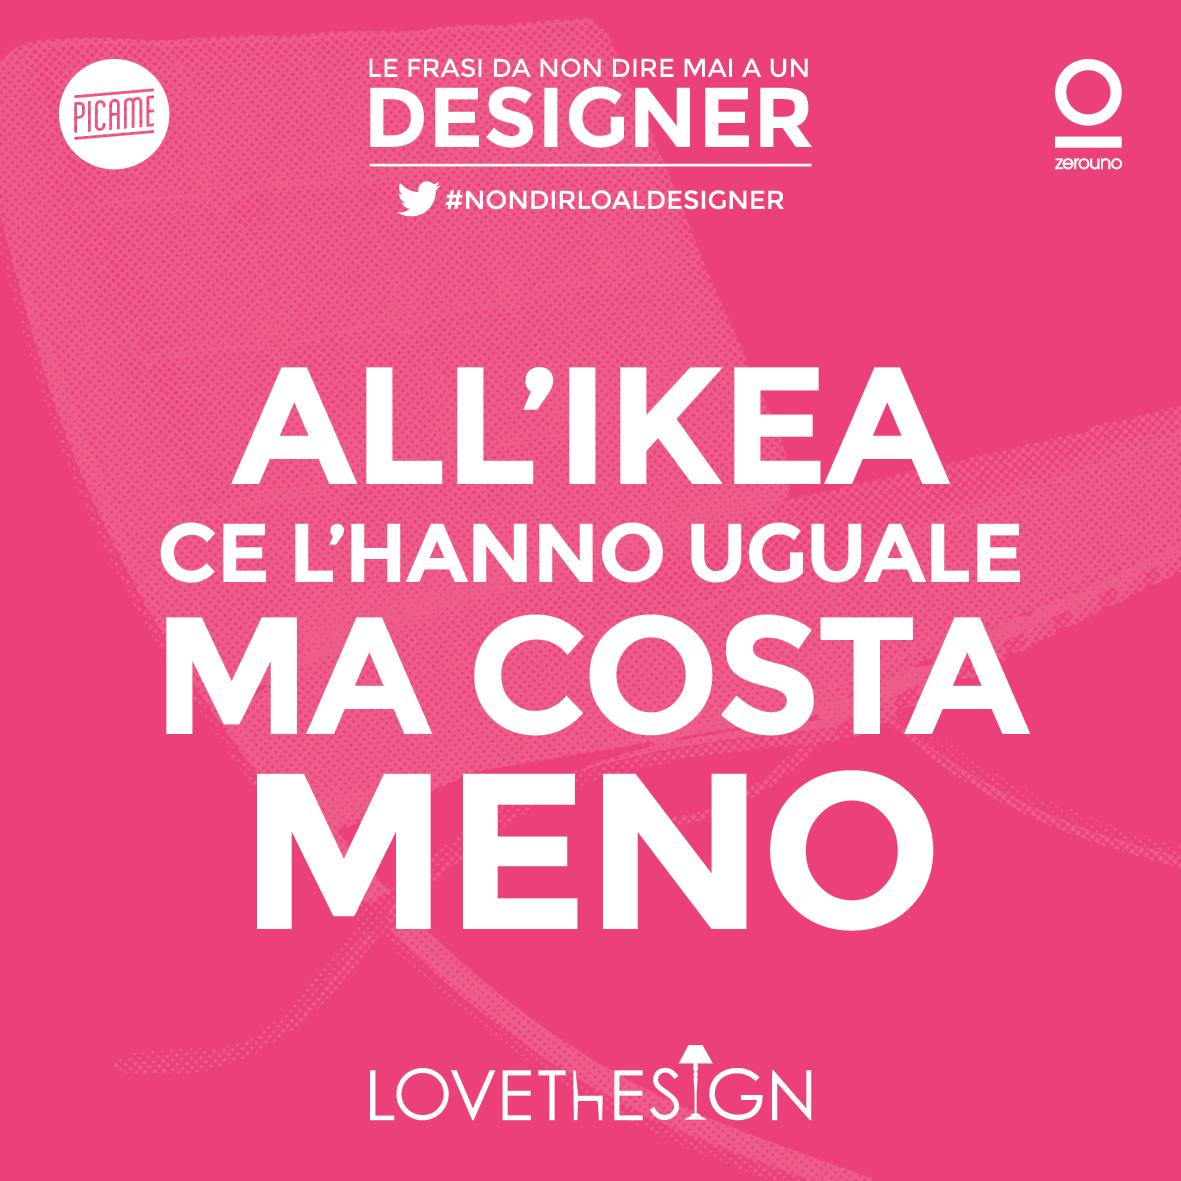 NonDirloalDesigner-Picame-Lovethesign-1